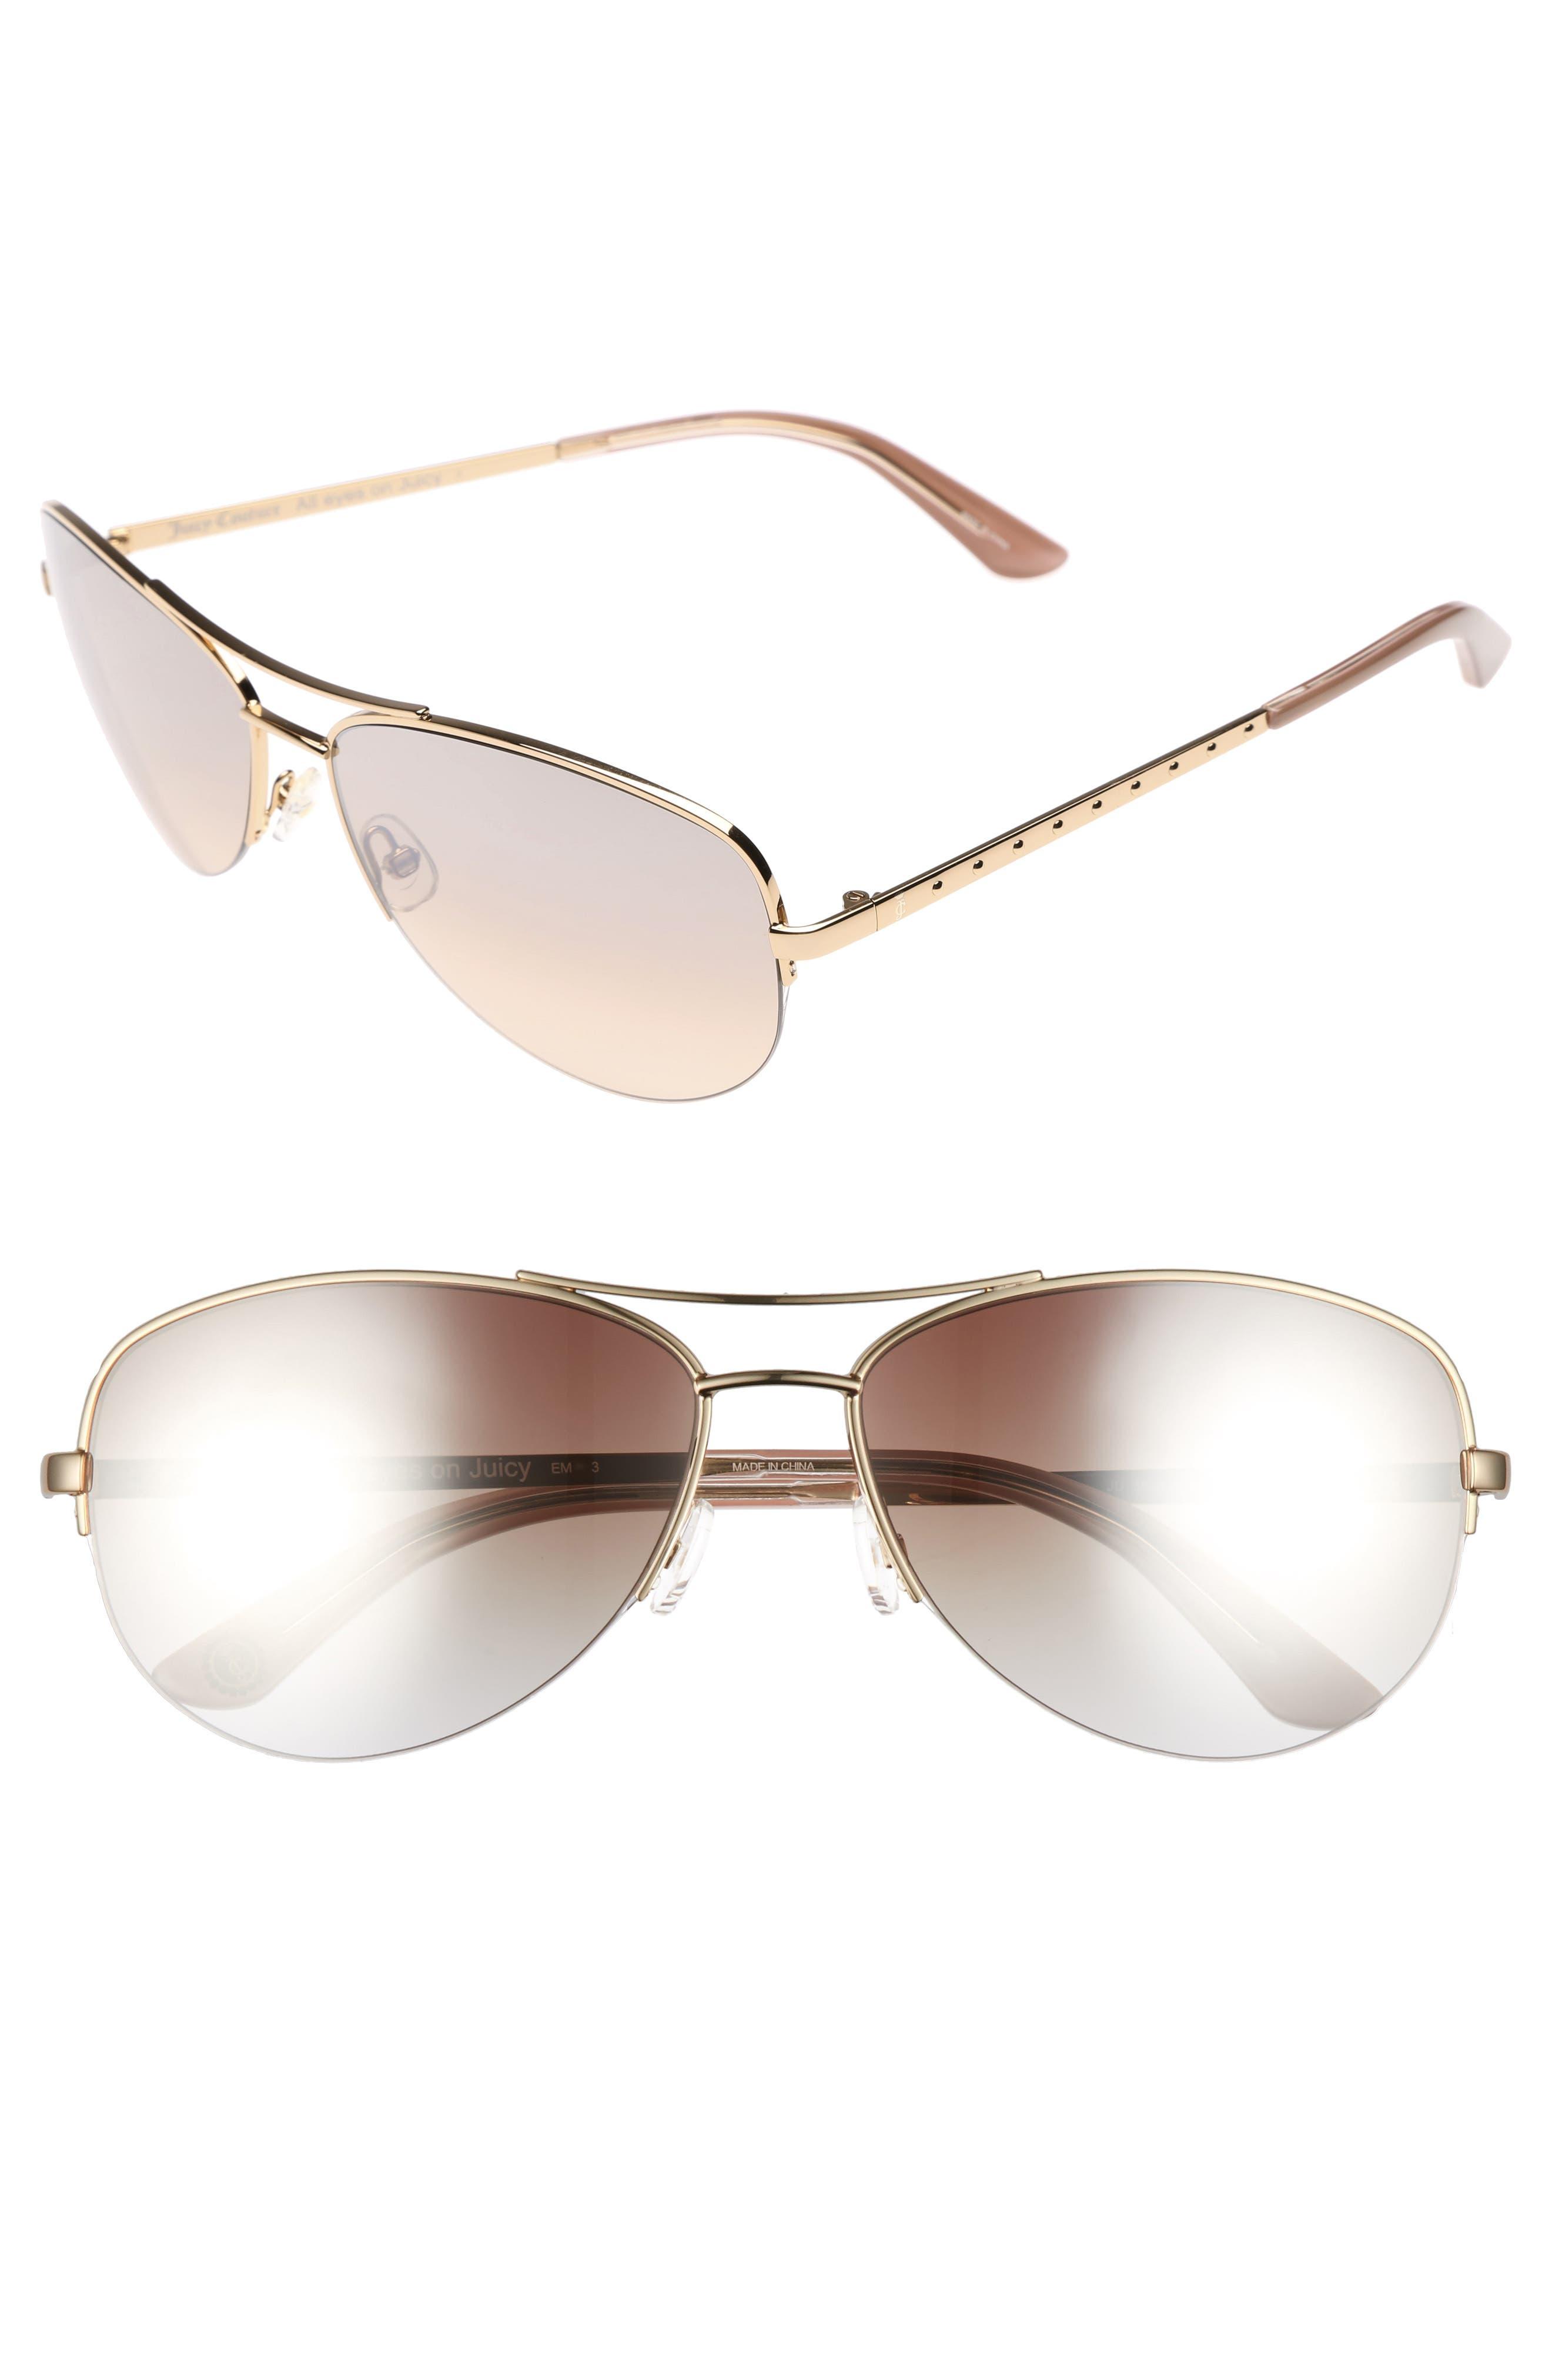 Black Label 60mm Gradient Aviator Sunglasses,                             Main thumbnail 1, color,                             Light Gold